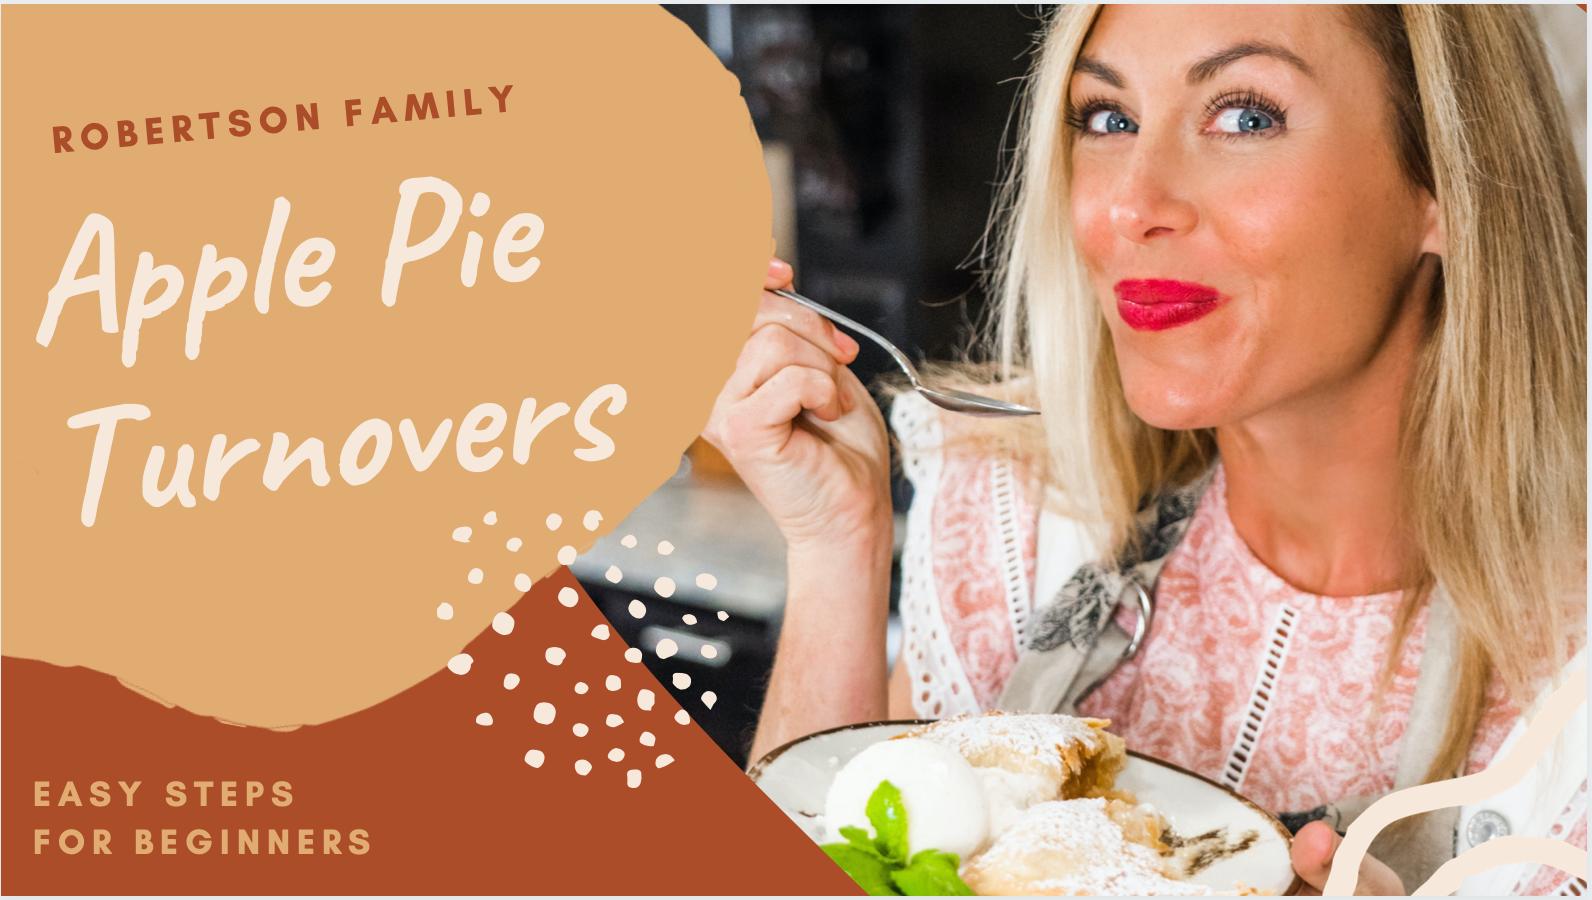 Apple Pie Recipe YouTube Cover